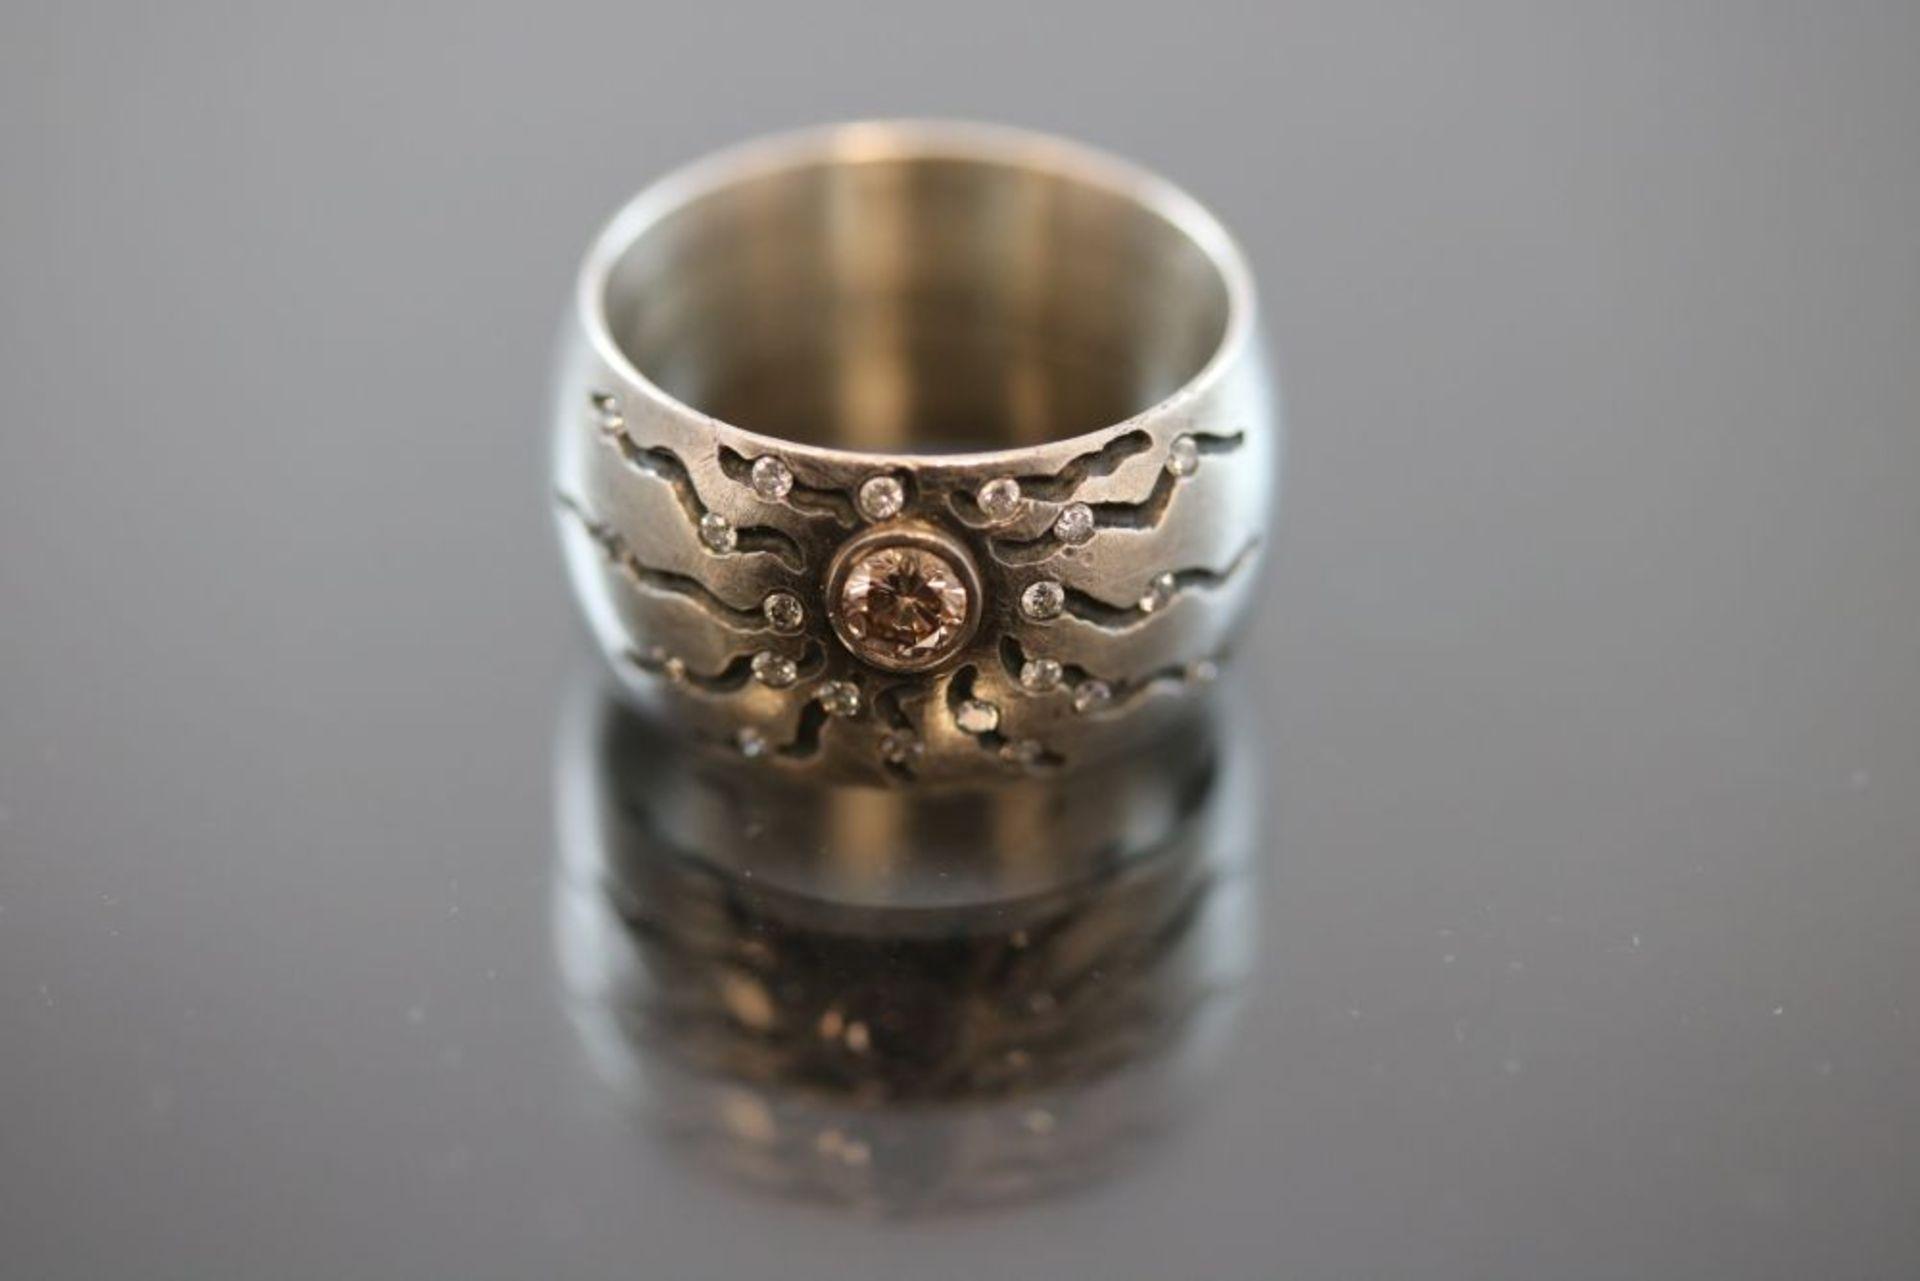 Brillant-Design-Ring, Silber/Gold